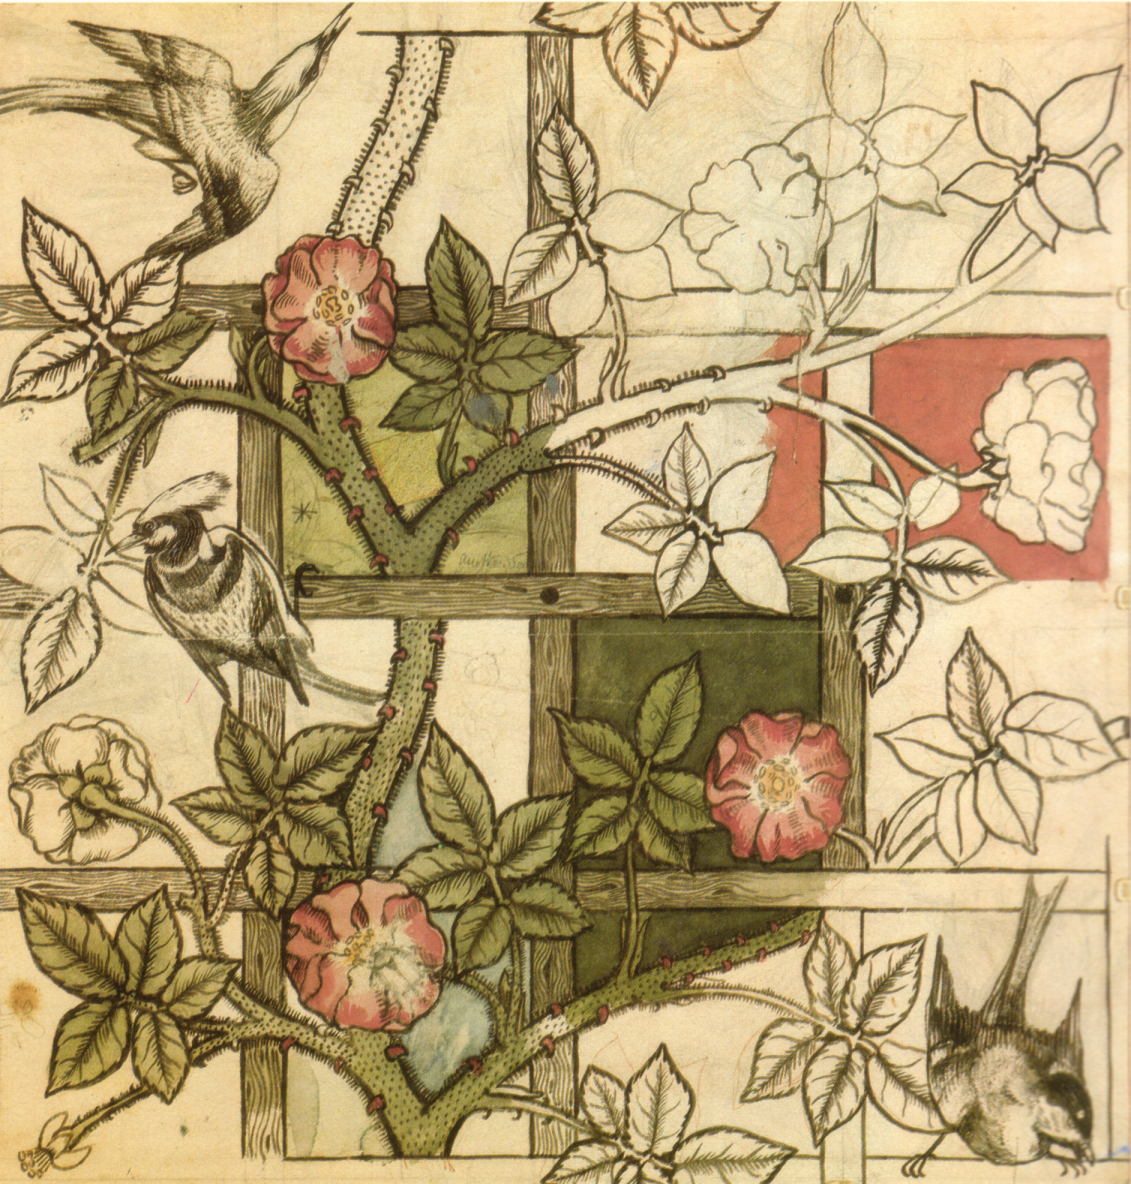 http://2.bp.blogspot.com/-Bu26lOcoZfc/TtcBanO3e3I/AAAAAAAAAIU/sFR14FAWcZU/s1600/William_Morris_design_for_Trellis_wallpaper_1862.jpg